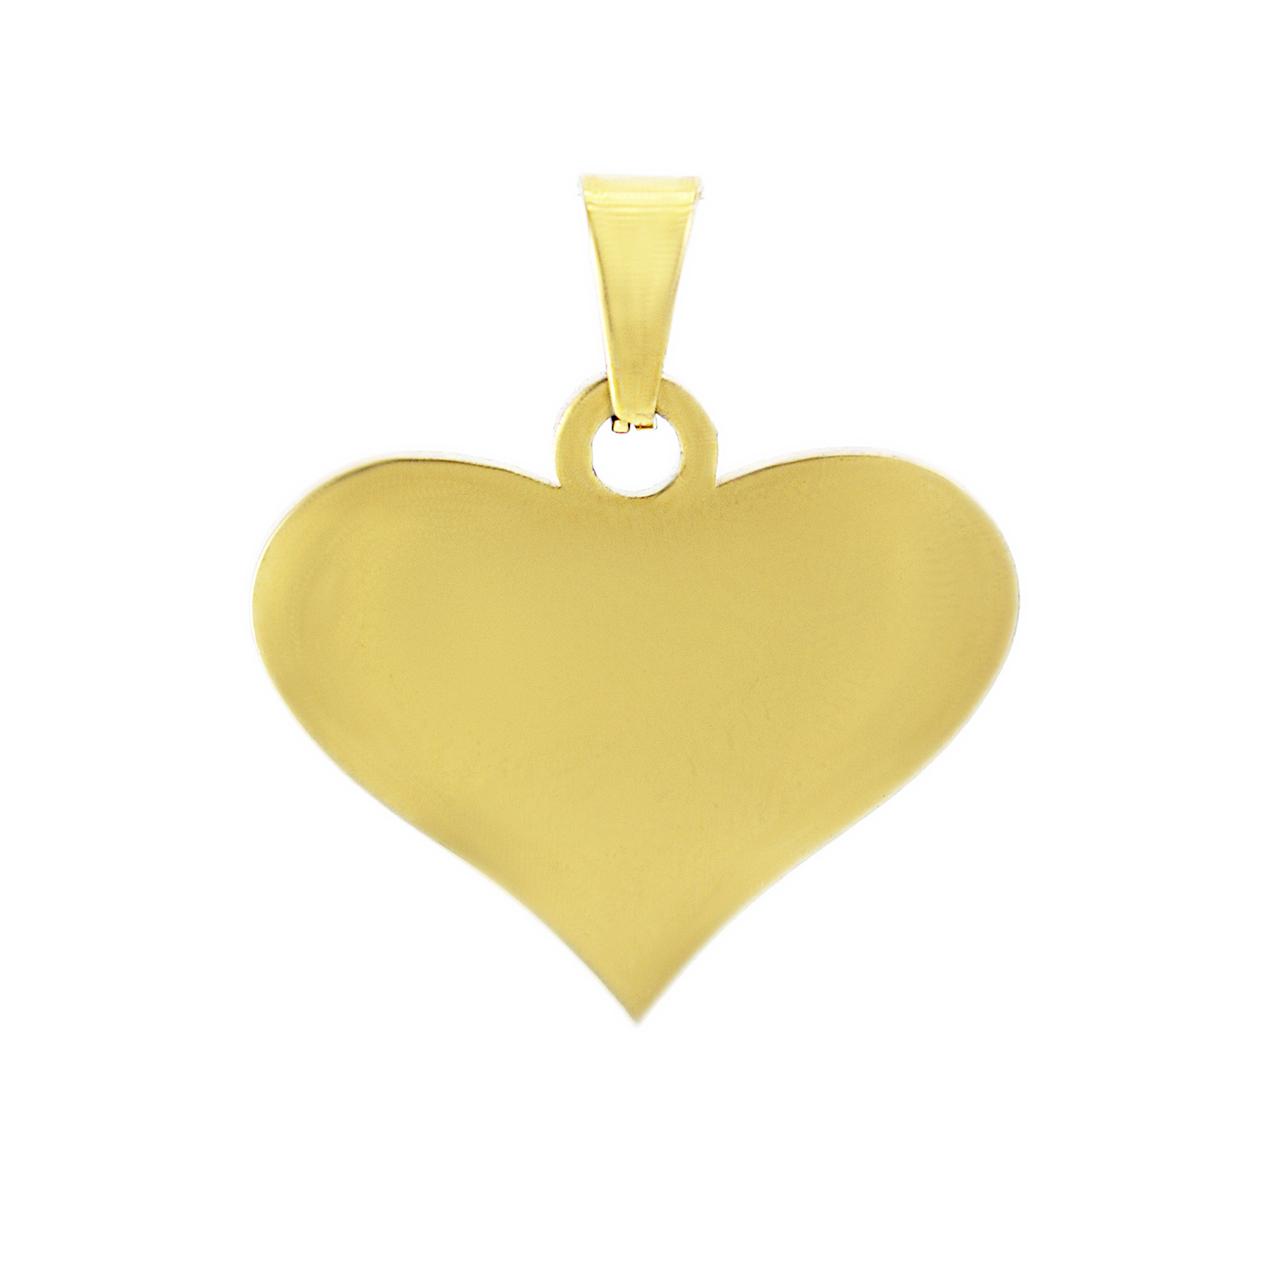 آویز گردنبند طلا 18 عیار جواهری میکا طرح قلب کد 0110001